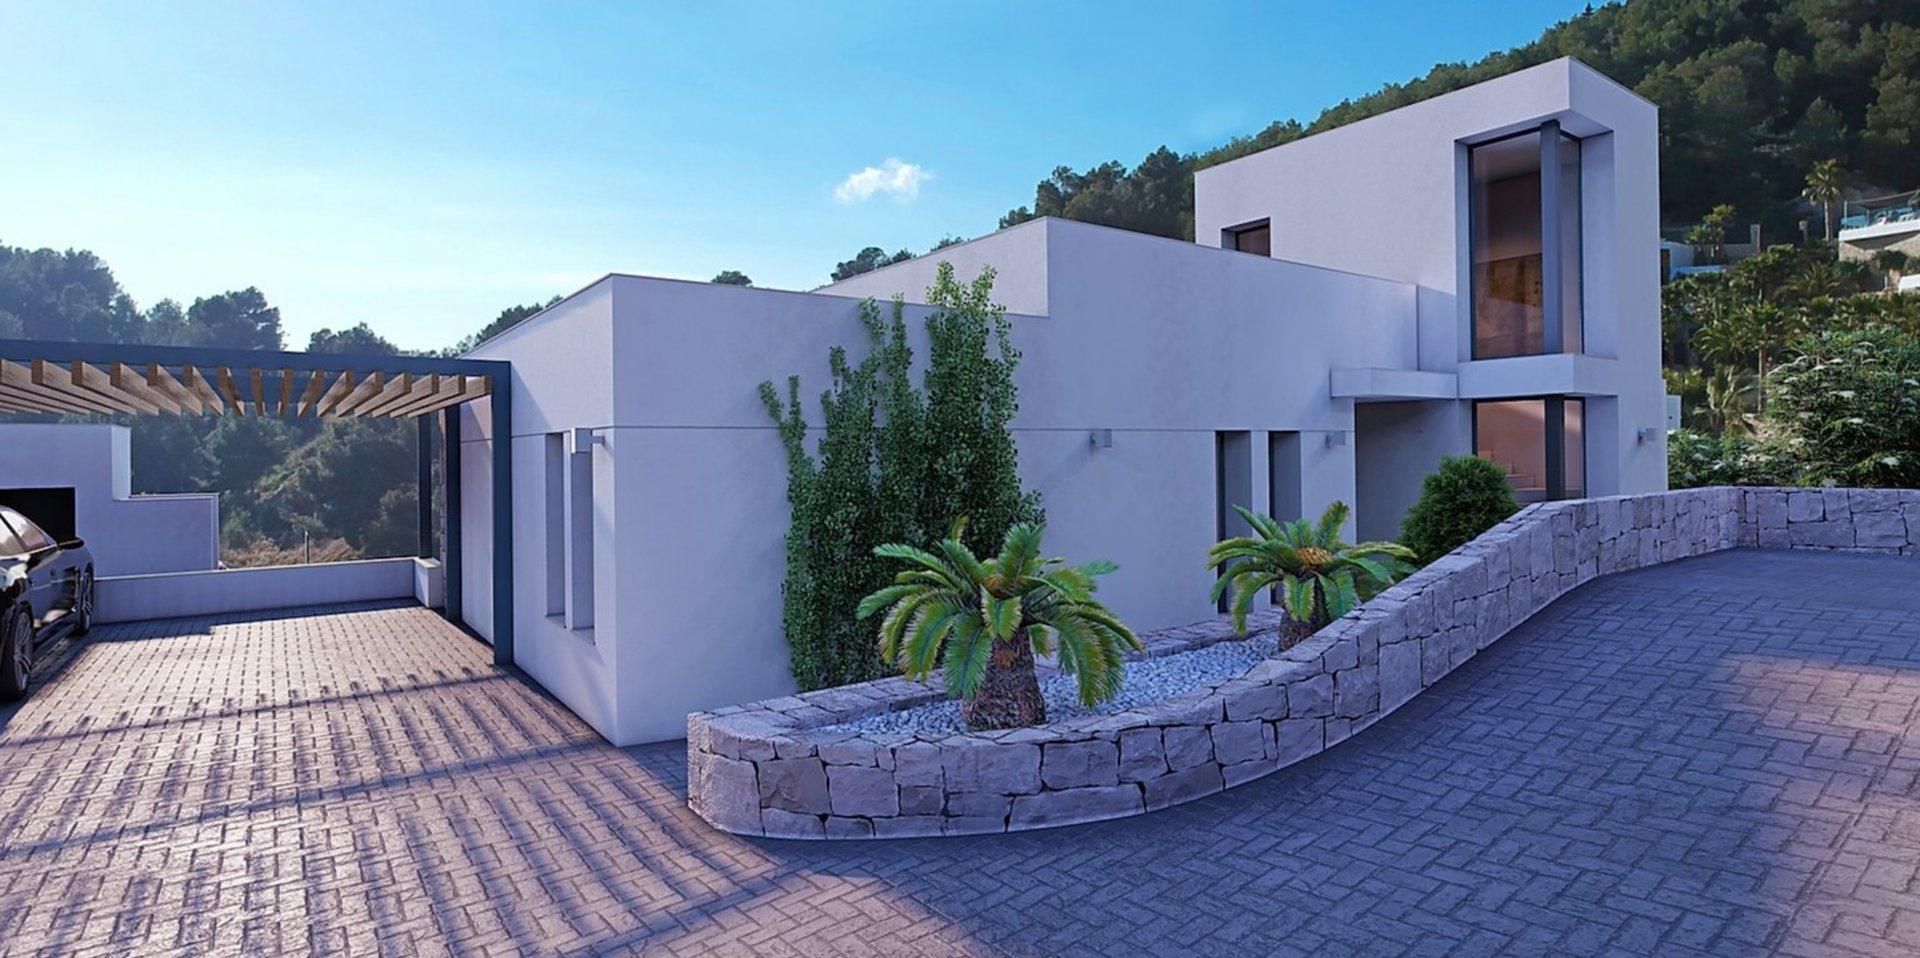 Single floor villa with 3 bedrooms